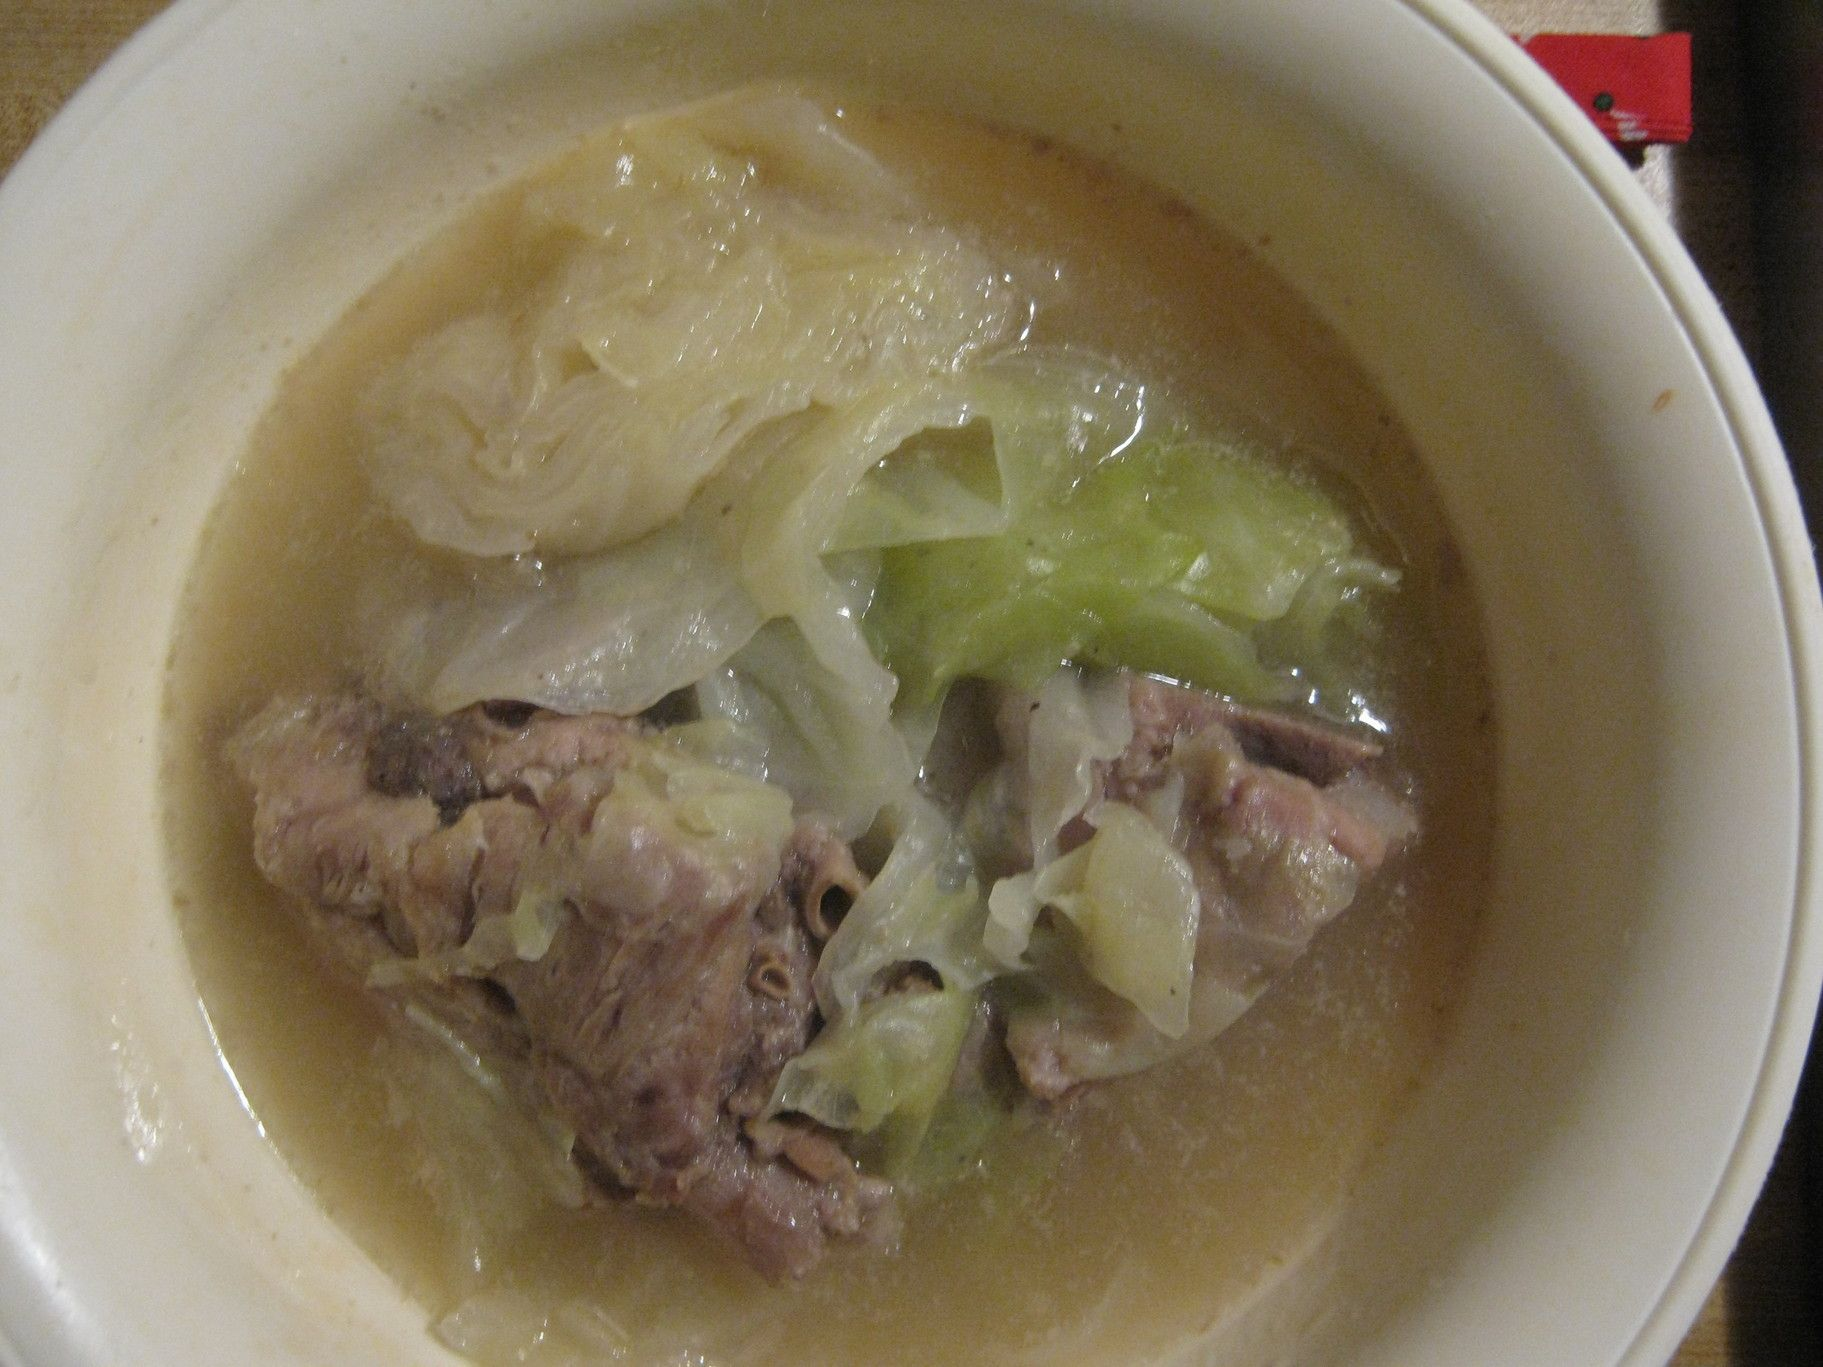 Cabbage pork recipes easy